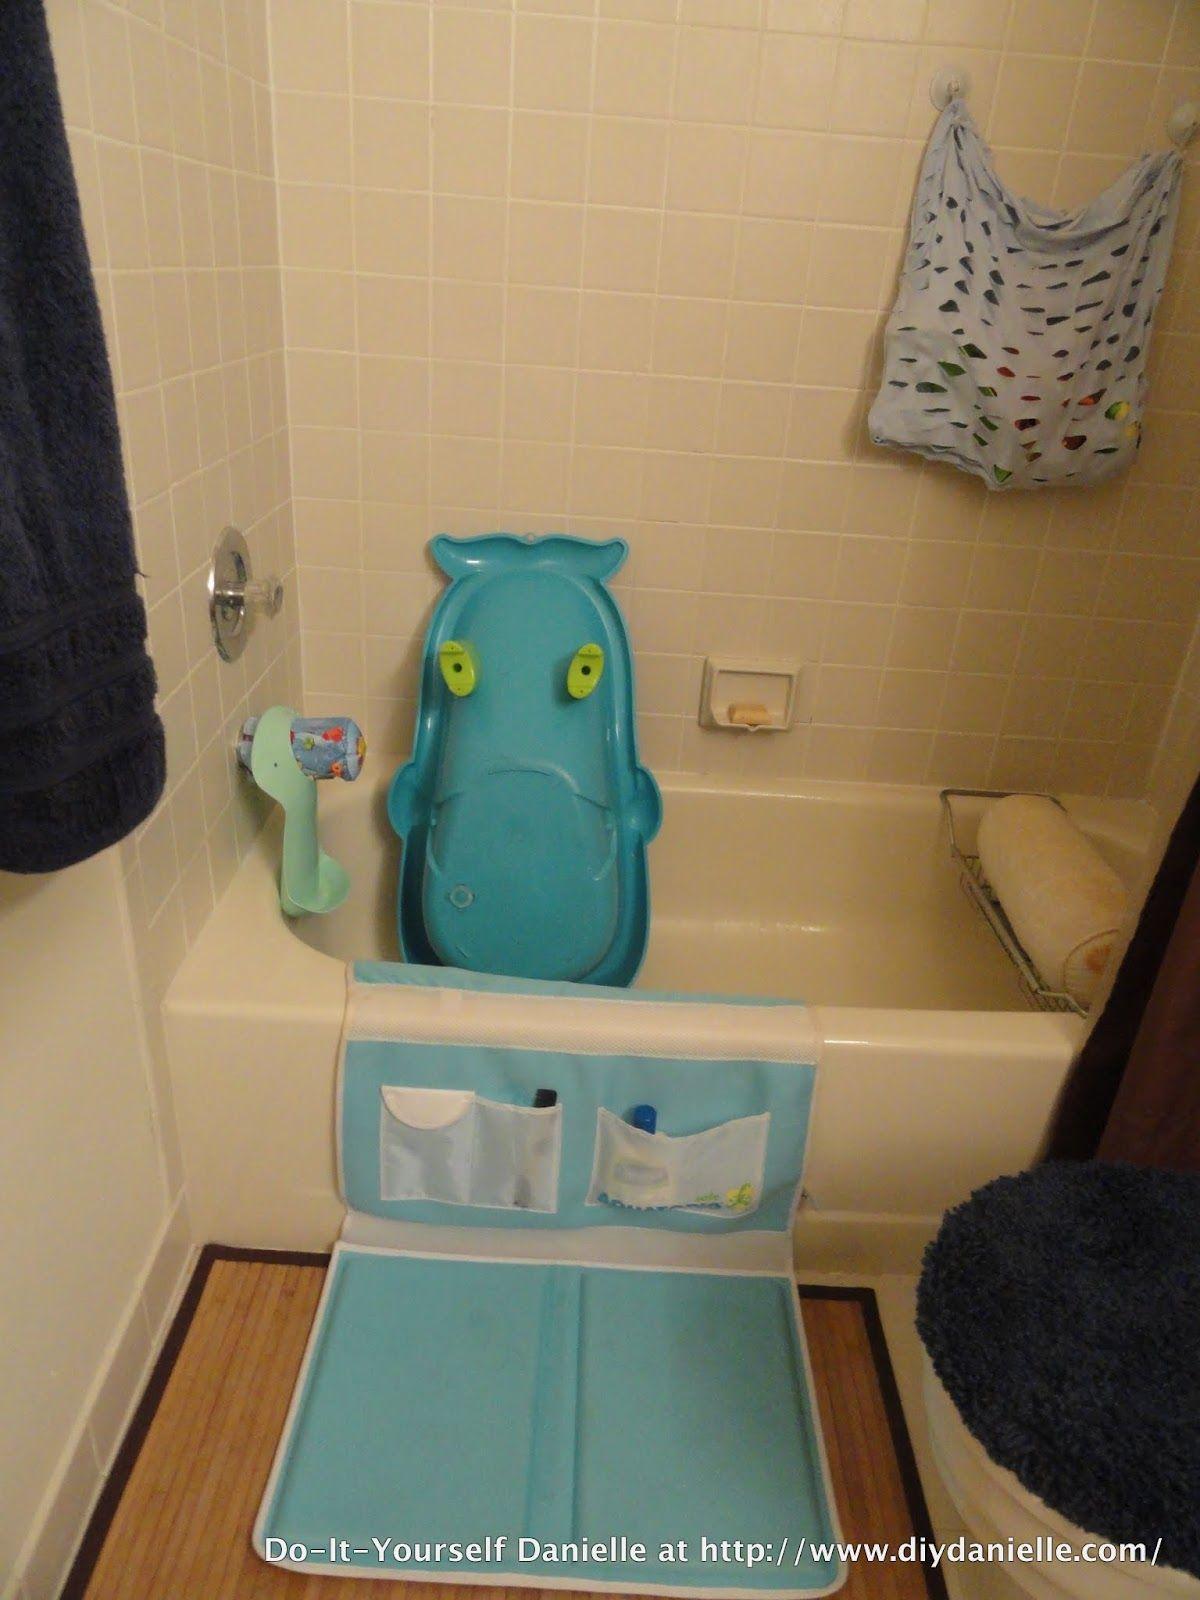 diy baby bathroom organization around the house baby bathroomdiy baby bathroom organization do it yourself danielle